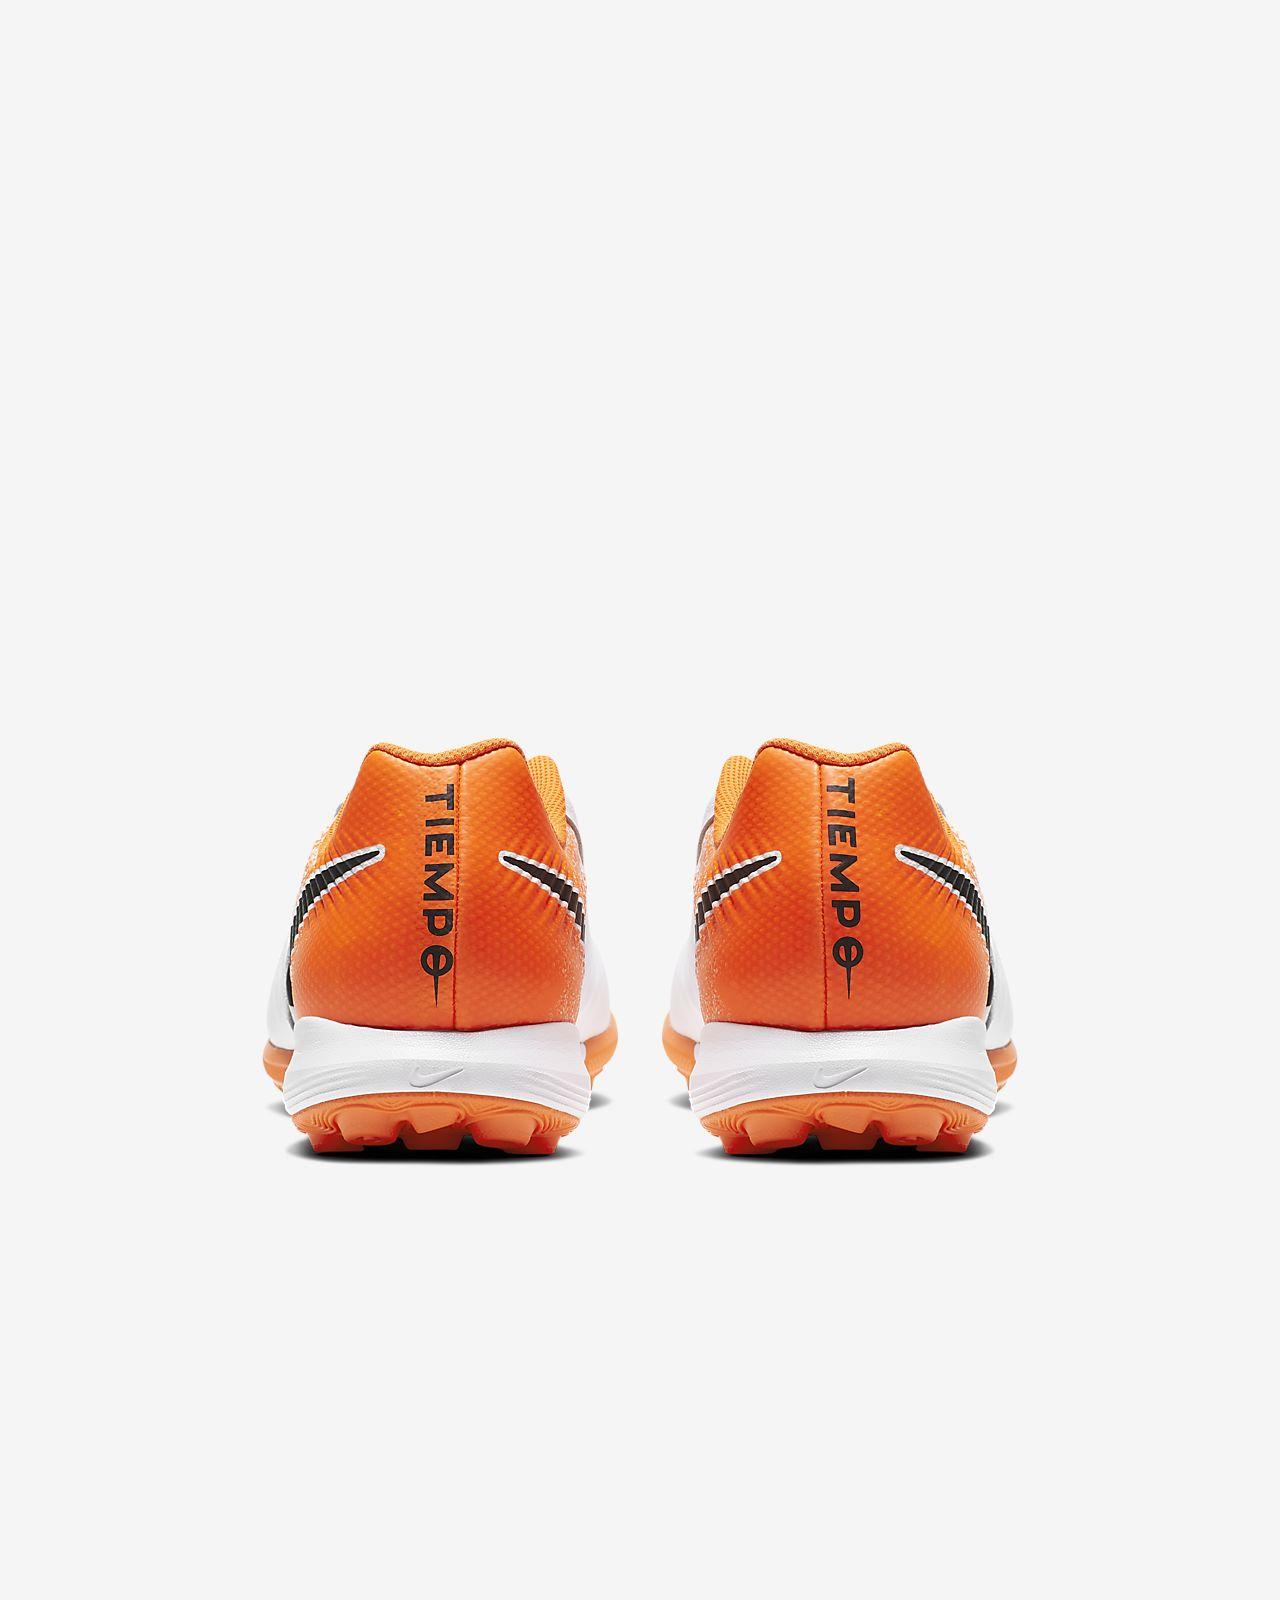 02d4bfbef117d ... Calzado de fútbol para césped sintético Nike TiempoX Lunar Legend VII  Pro